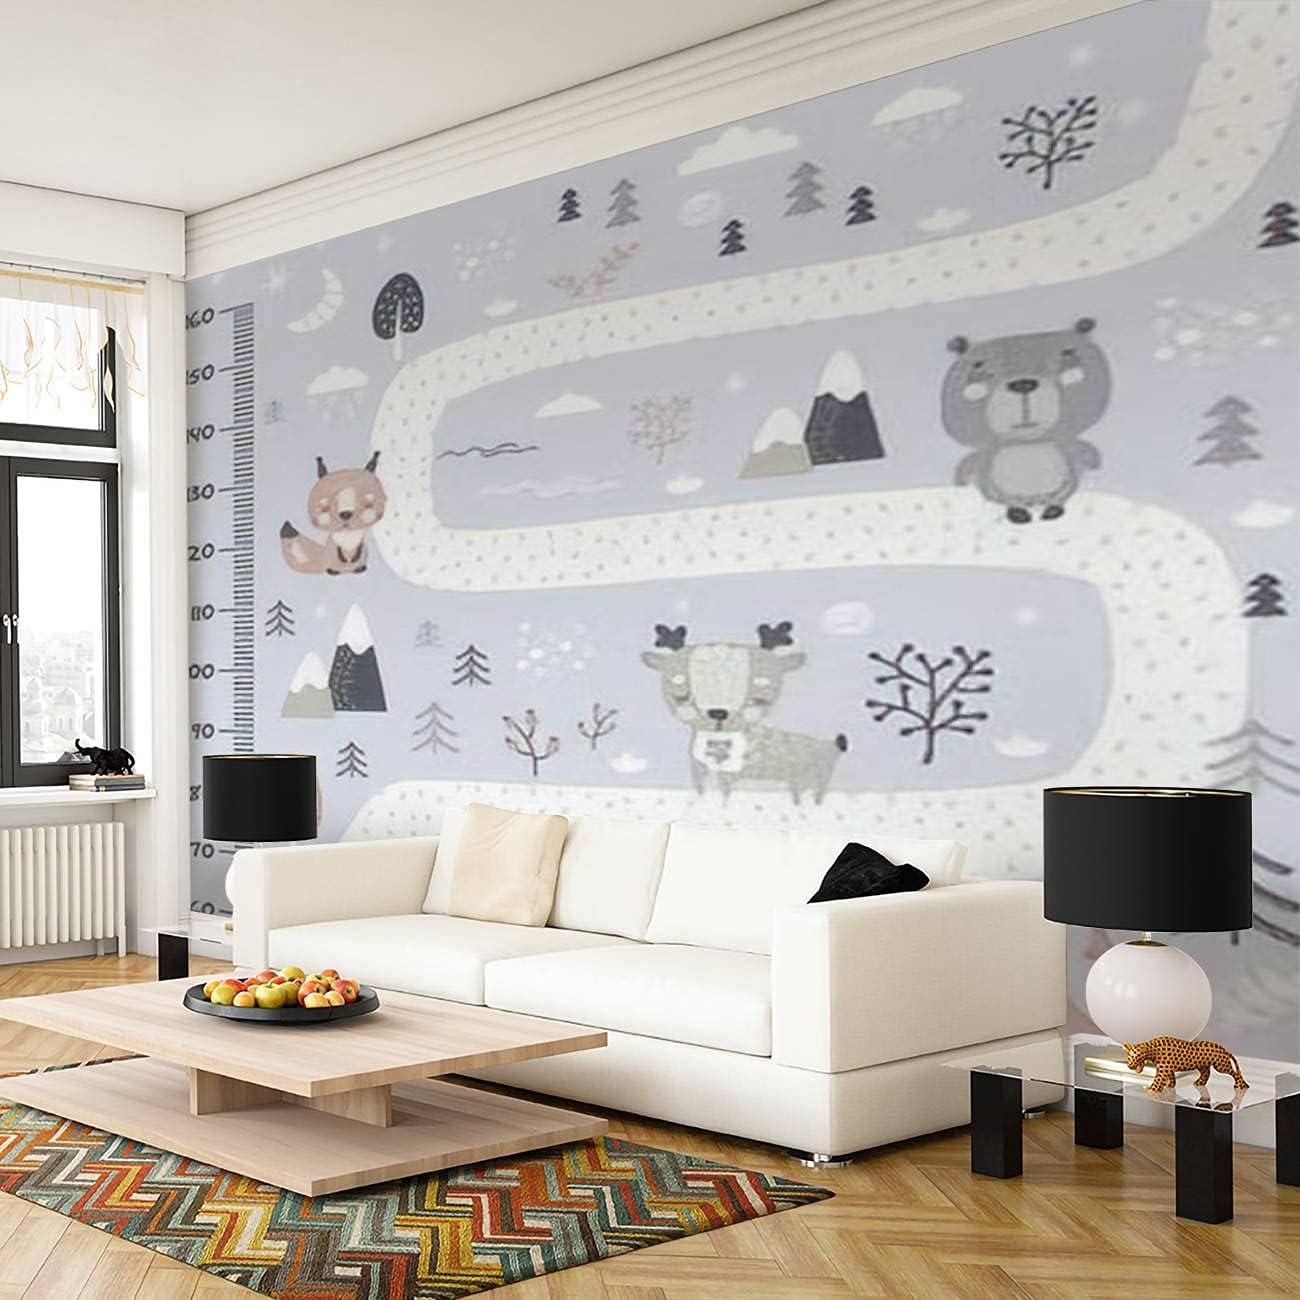 Self Adhesive Peel and High material Stick Wallpaper Kids Wall PVC Print Max 62% OFF Mural